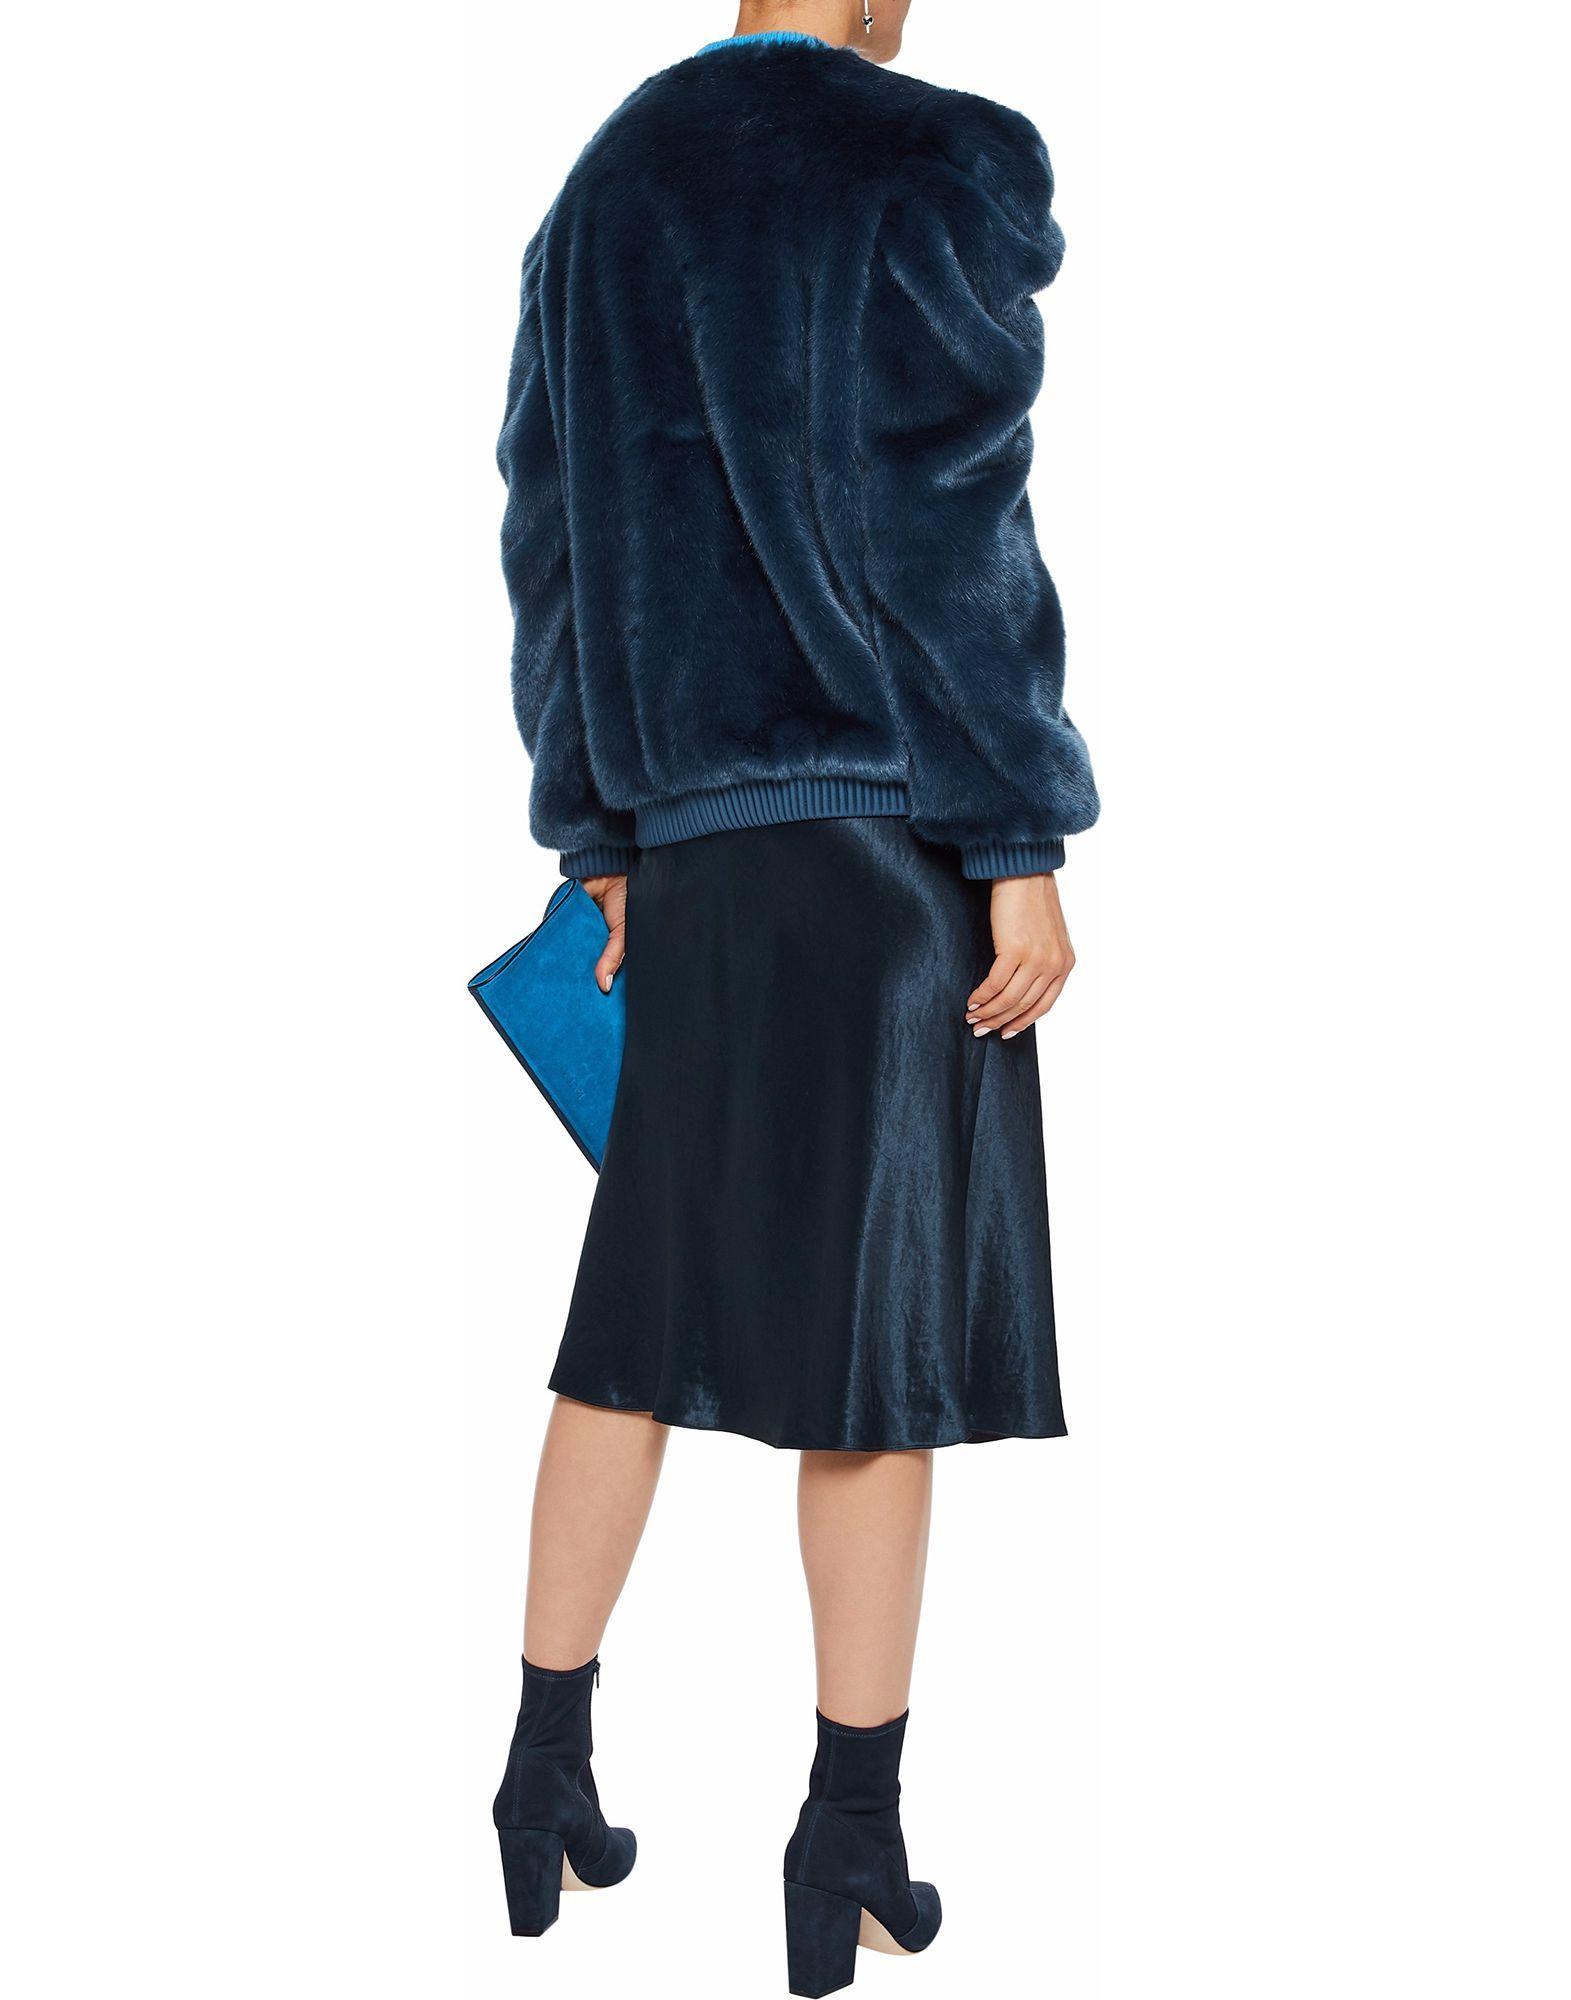 Nina Ricci Women's Teddy Coat Modacrylic